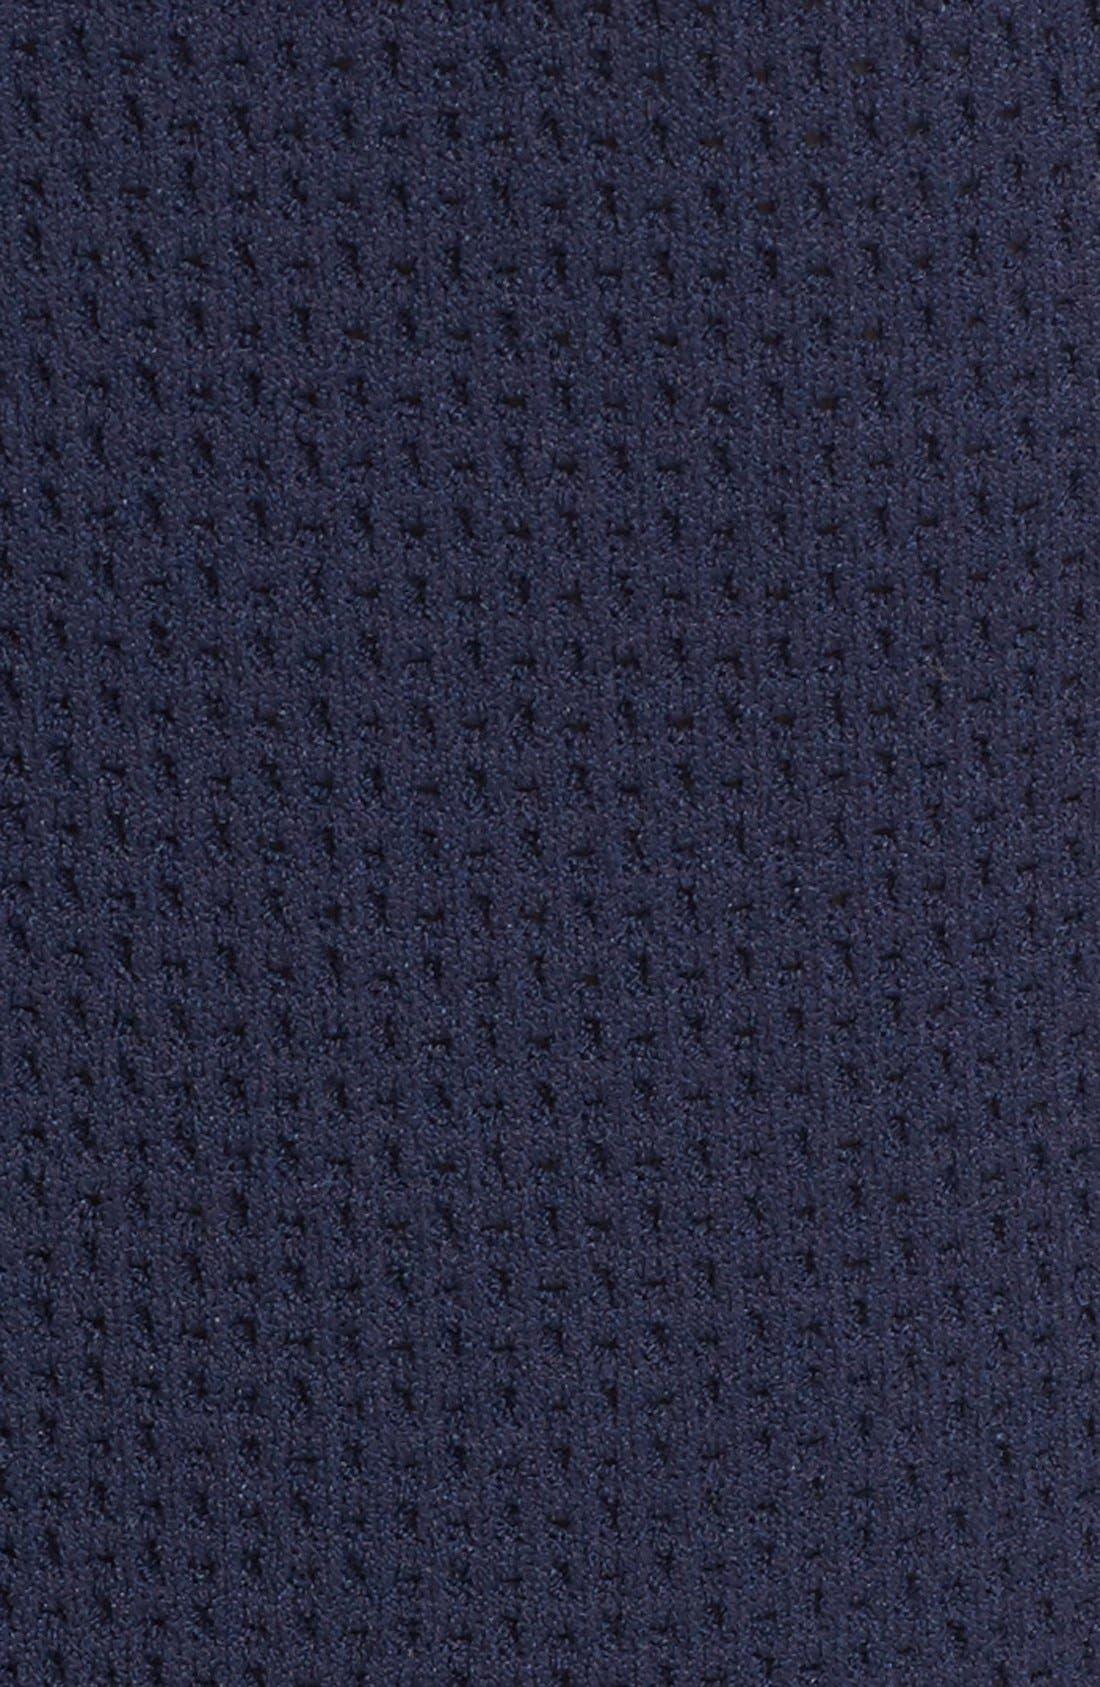 Alternate Image 3  - Victoria Beckham Crochet Knit Sheath Dress